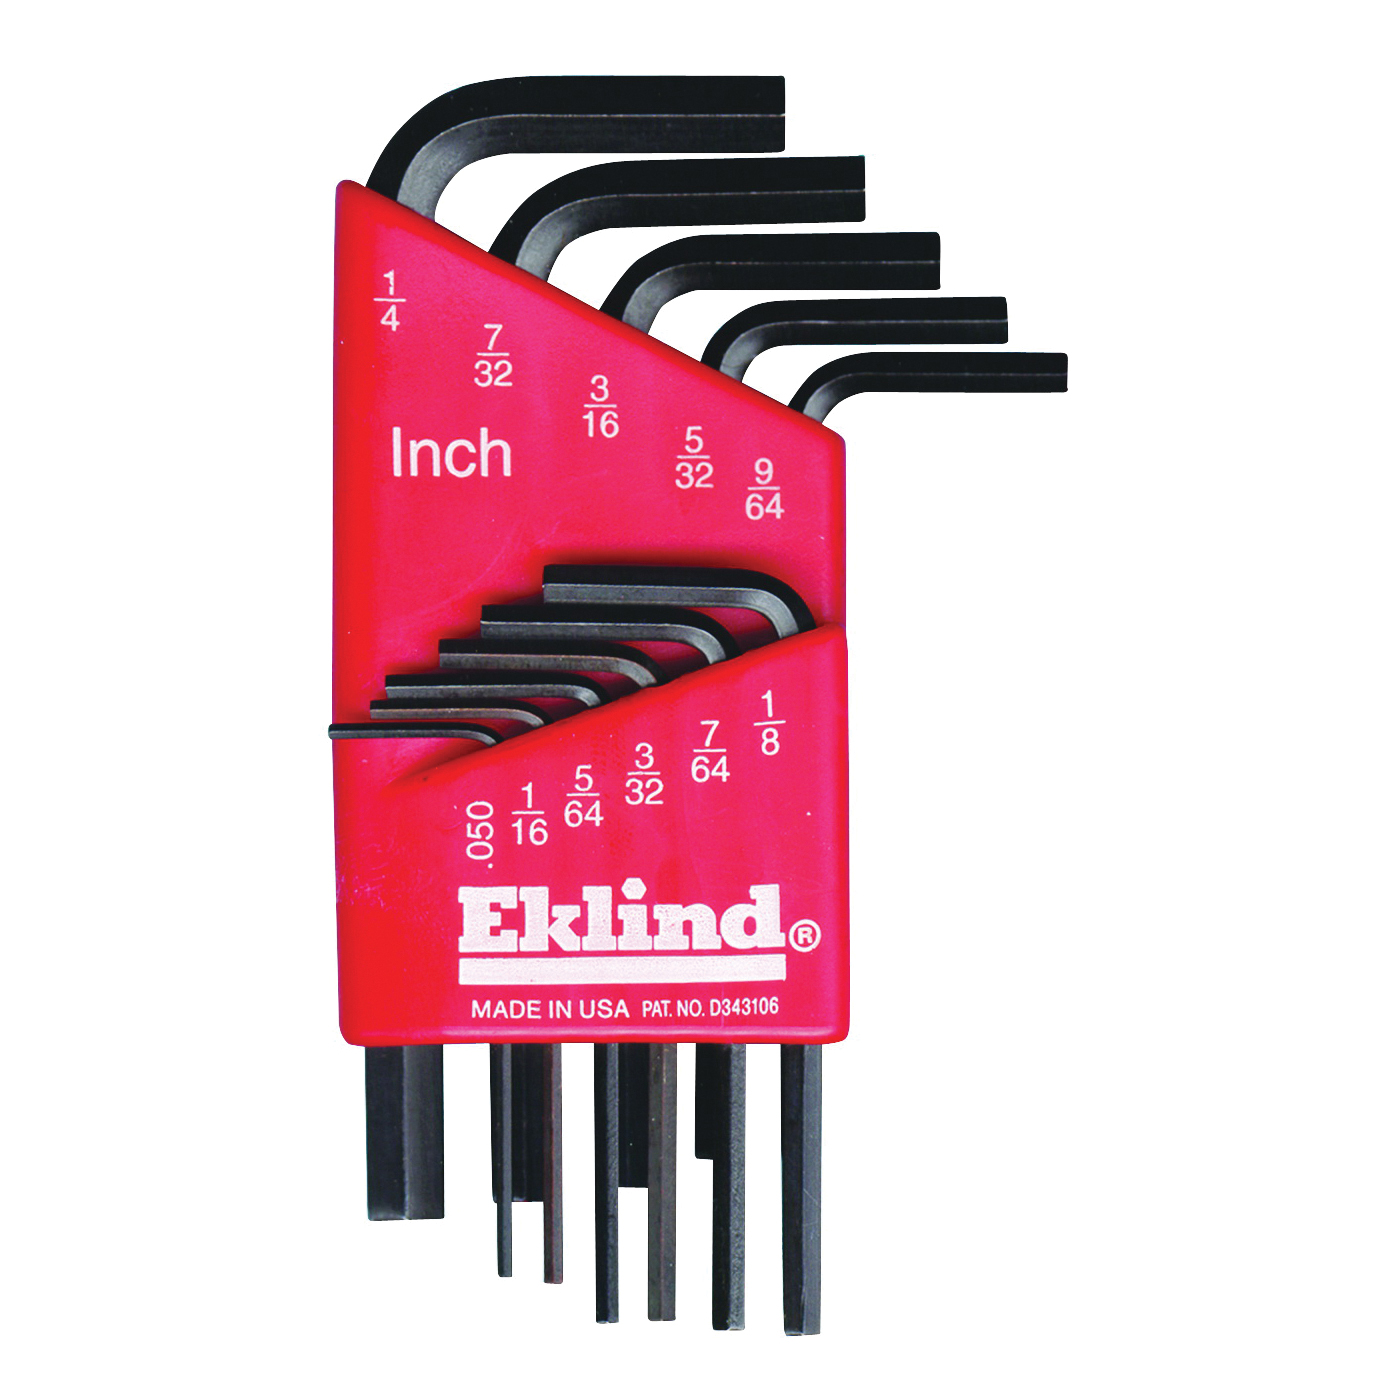 Picture of Eklind 10111 Hex Key Set, 11 -Piece, Steel, Black